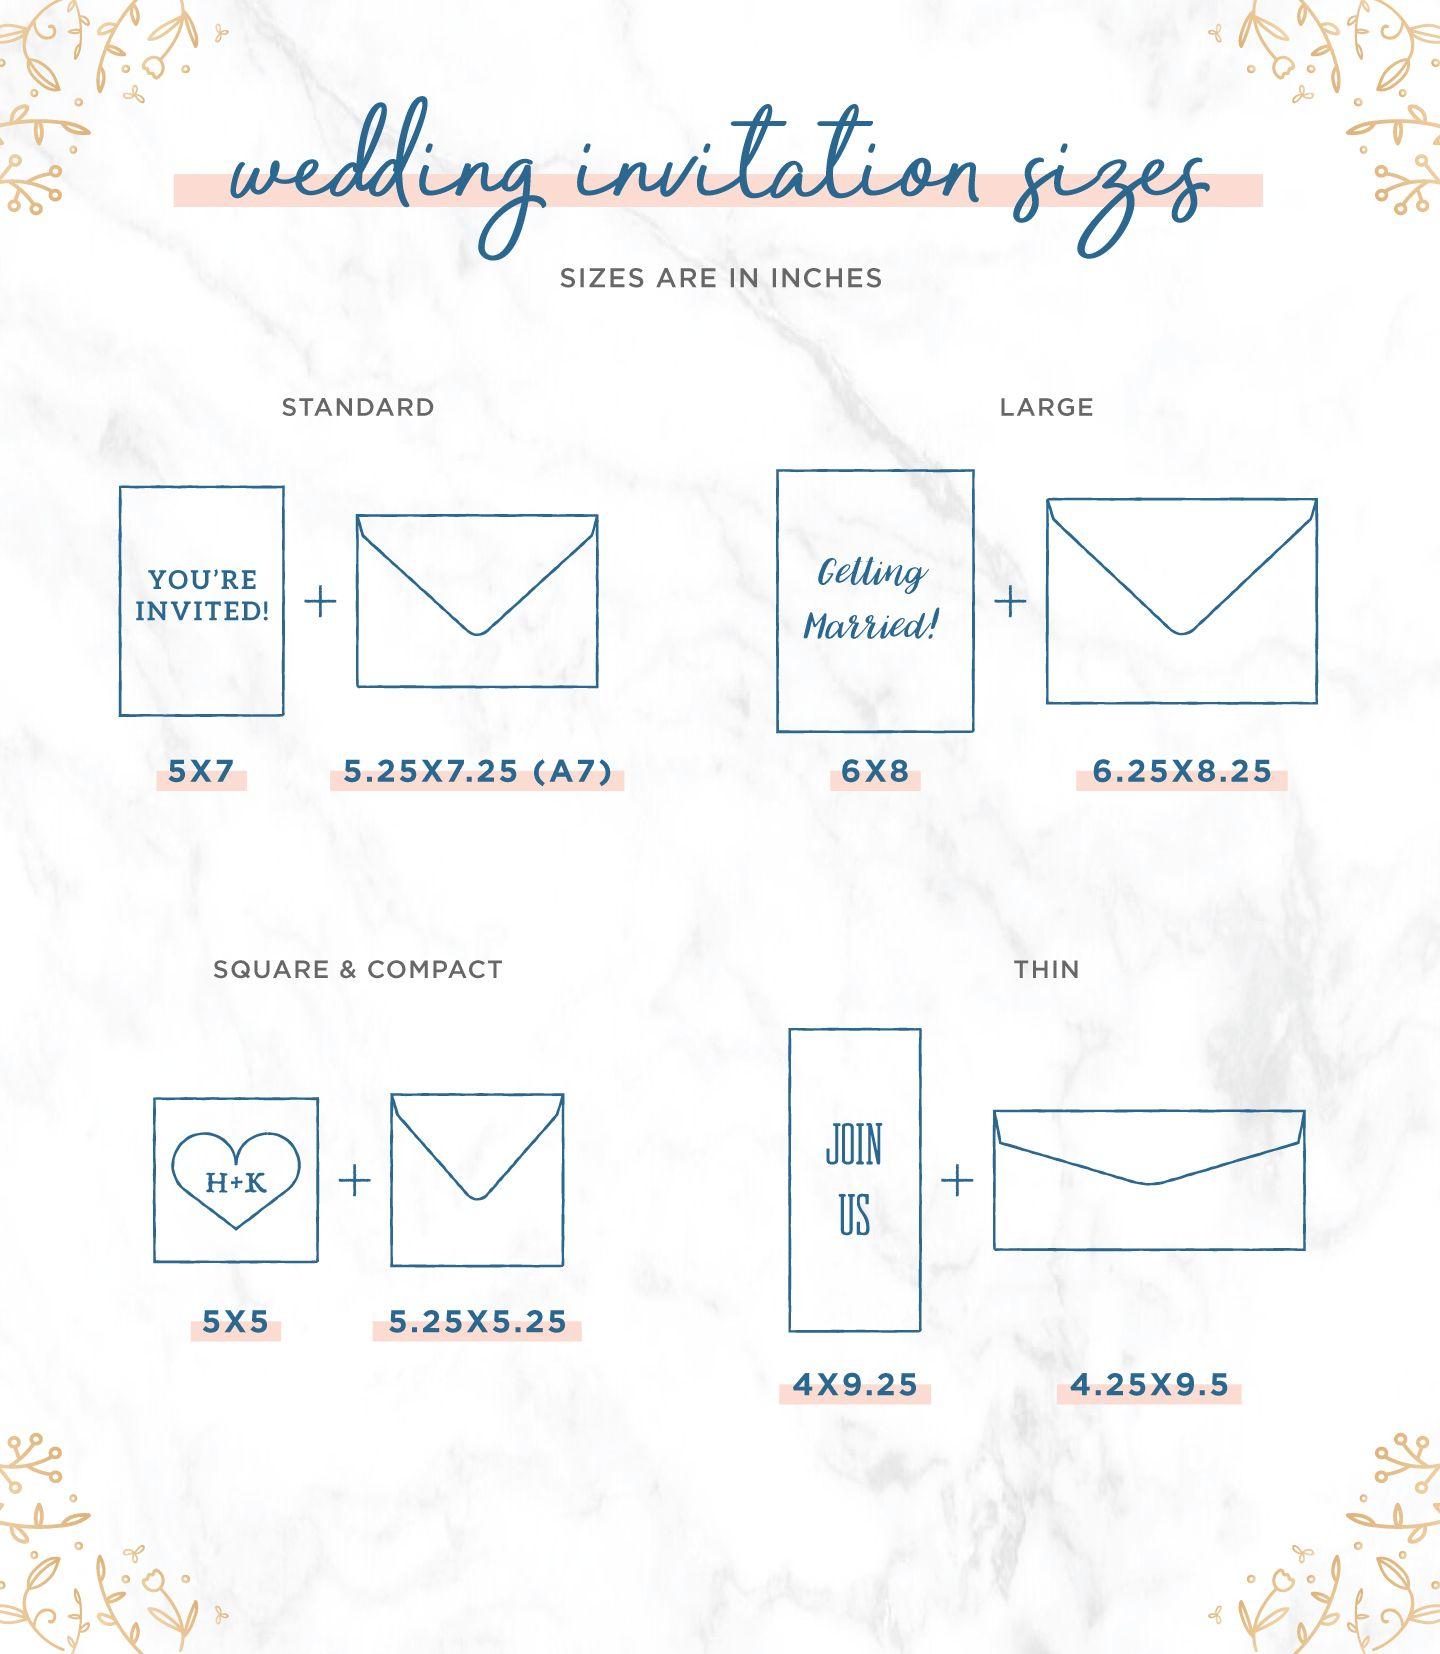 Most Popular Wedding Invitation Sizes Stationary Suite Tips Wedding Invitation Size Standard Wedding Invitation Size Popular Wedding Invitations